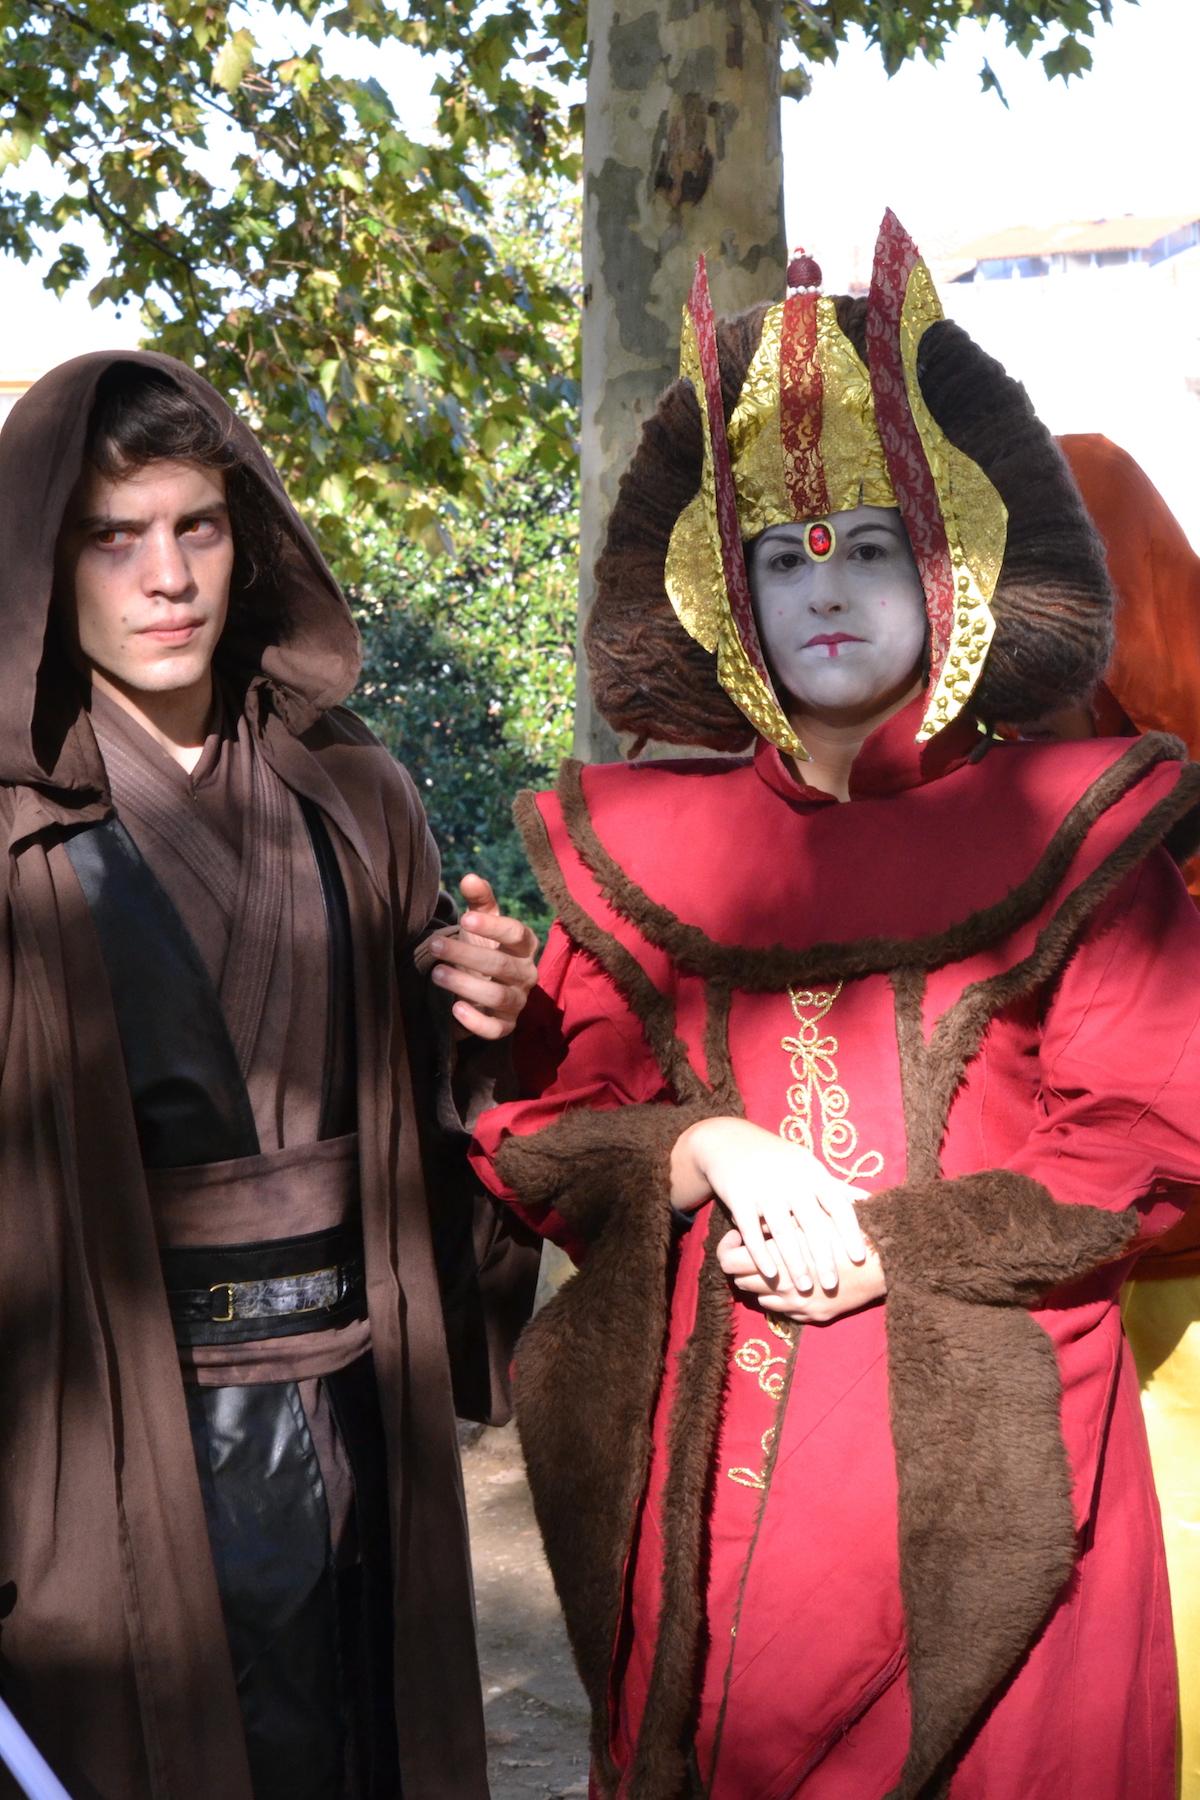 Lucca 2015: Cosplay di Padmé Amidala e Anakin Skywalker